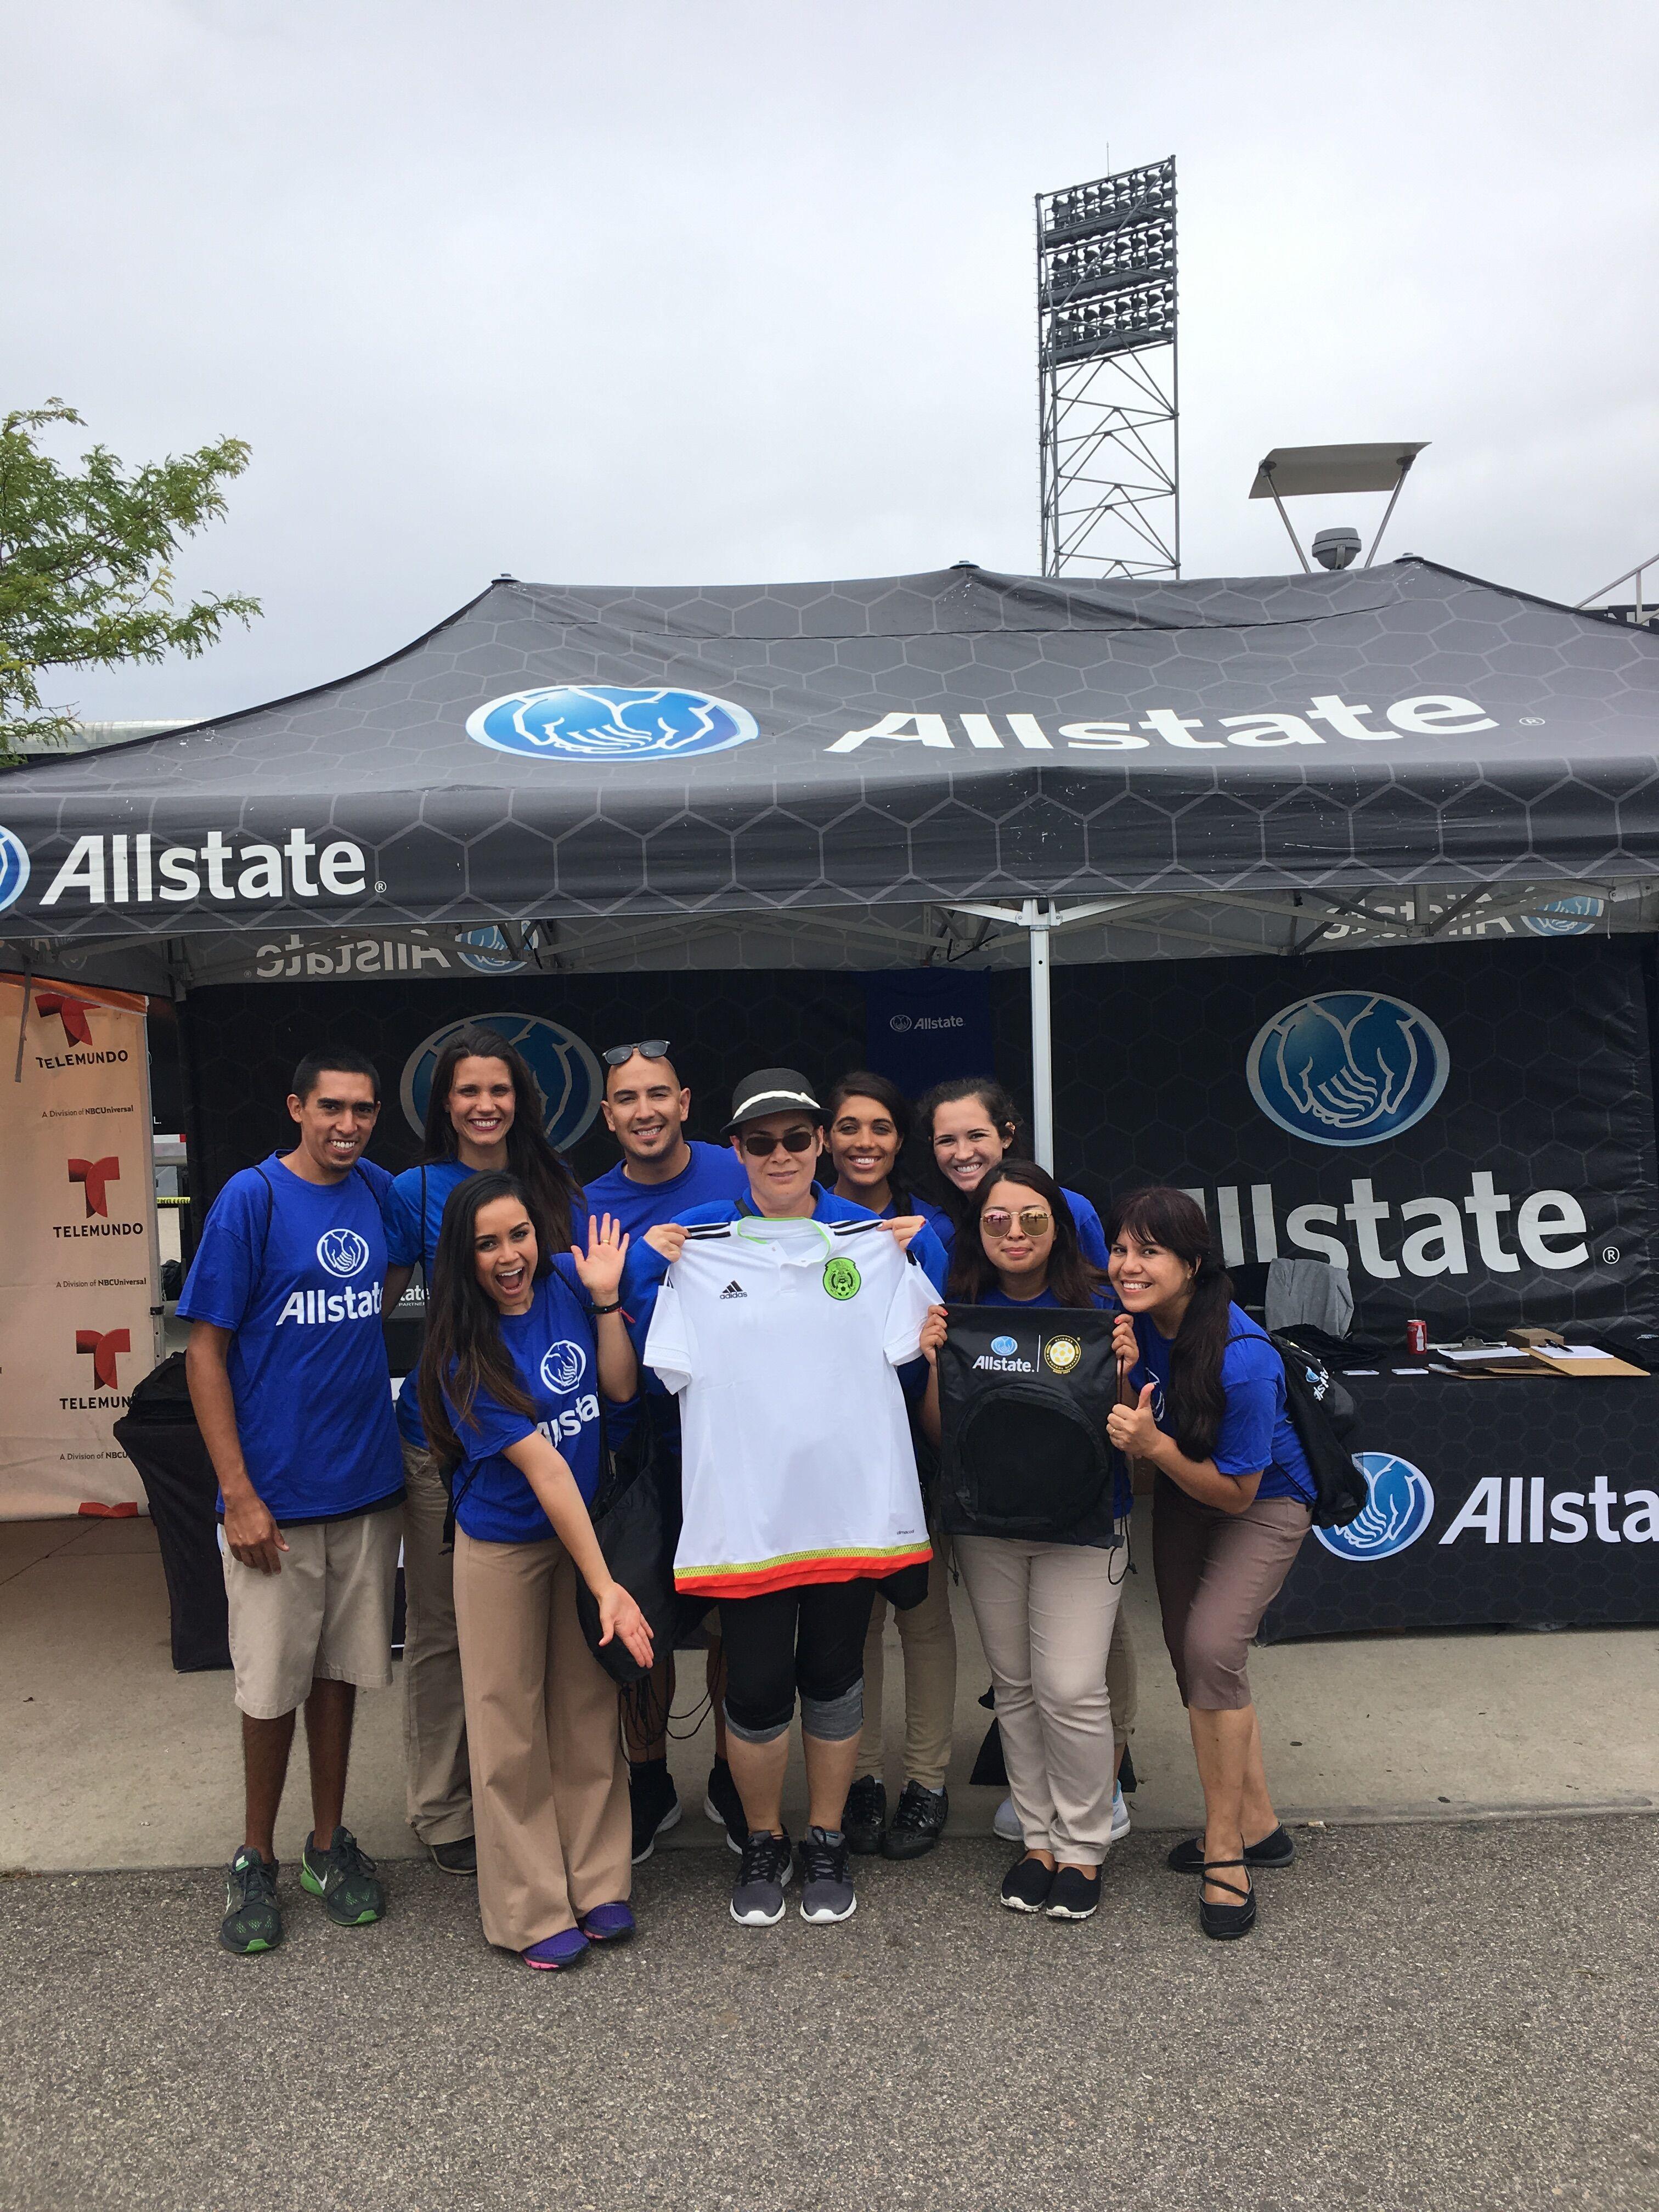 Juanita K. Martin: Allstate Insurance image 27